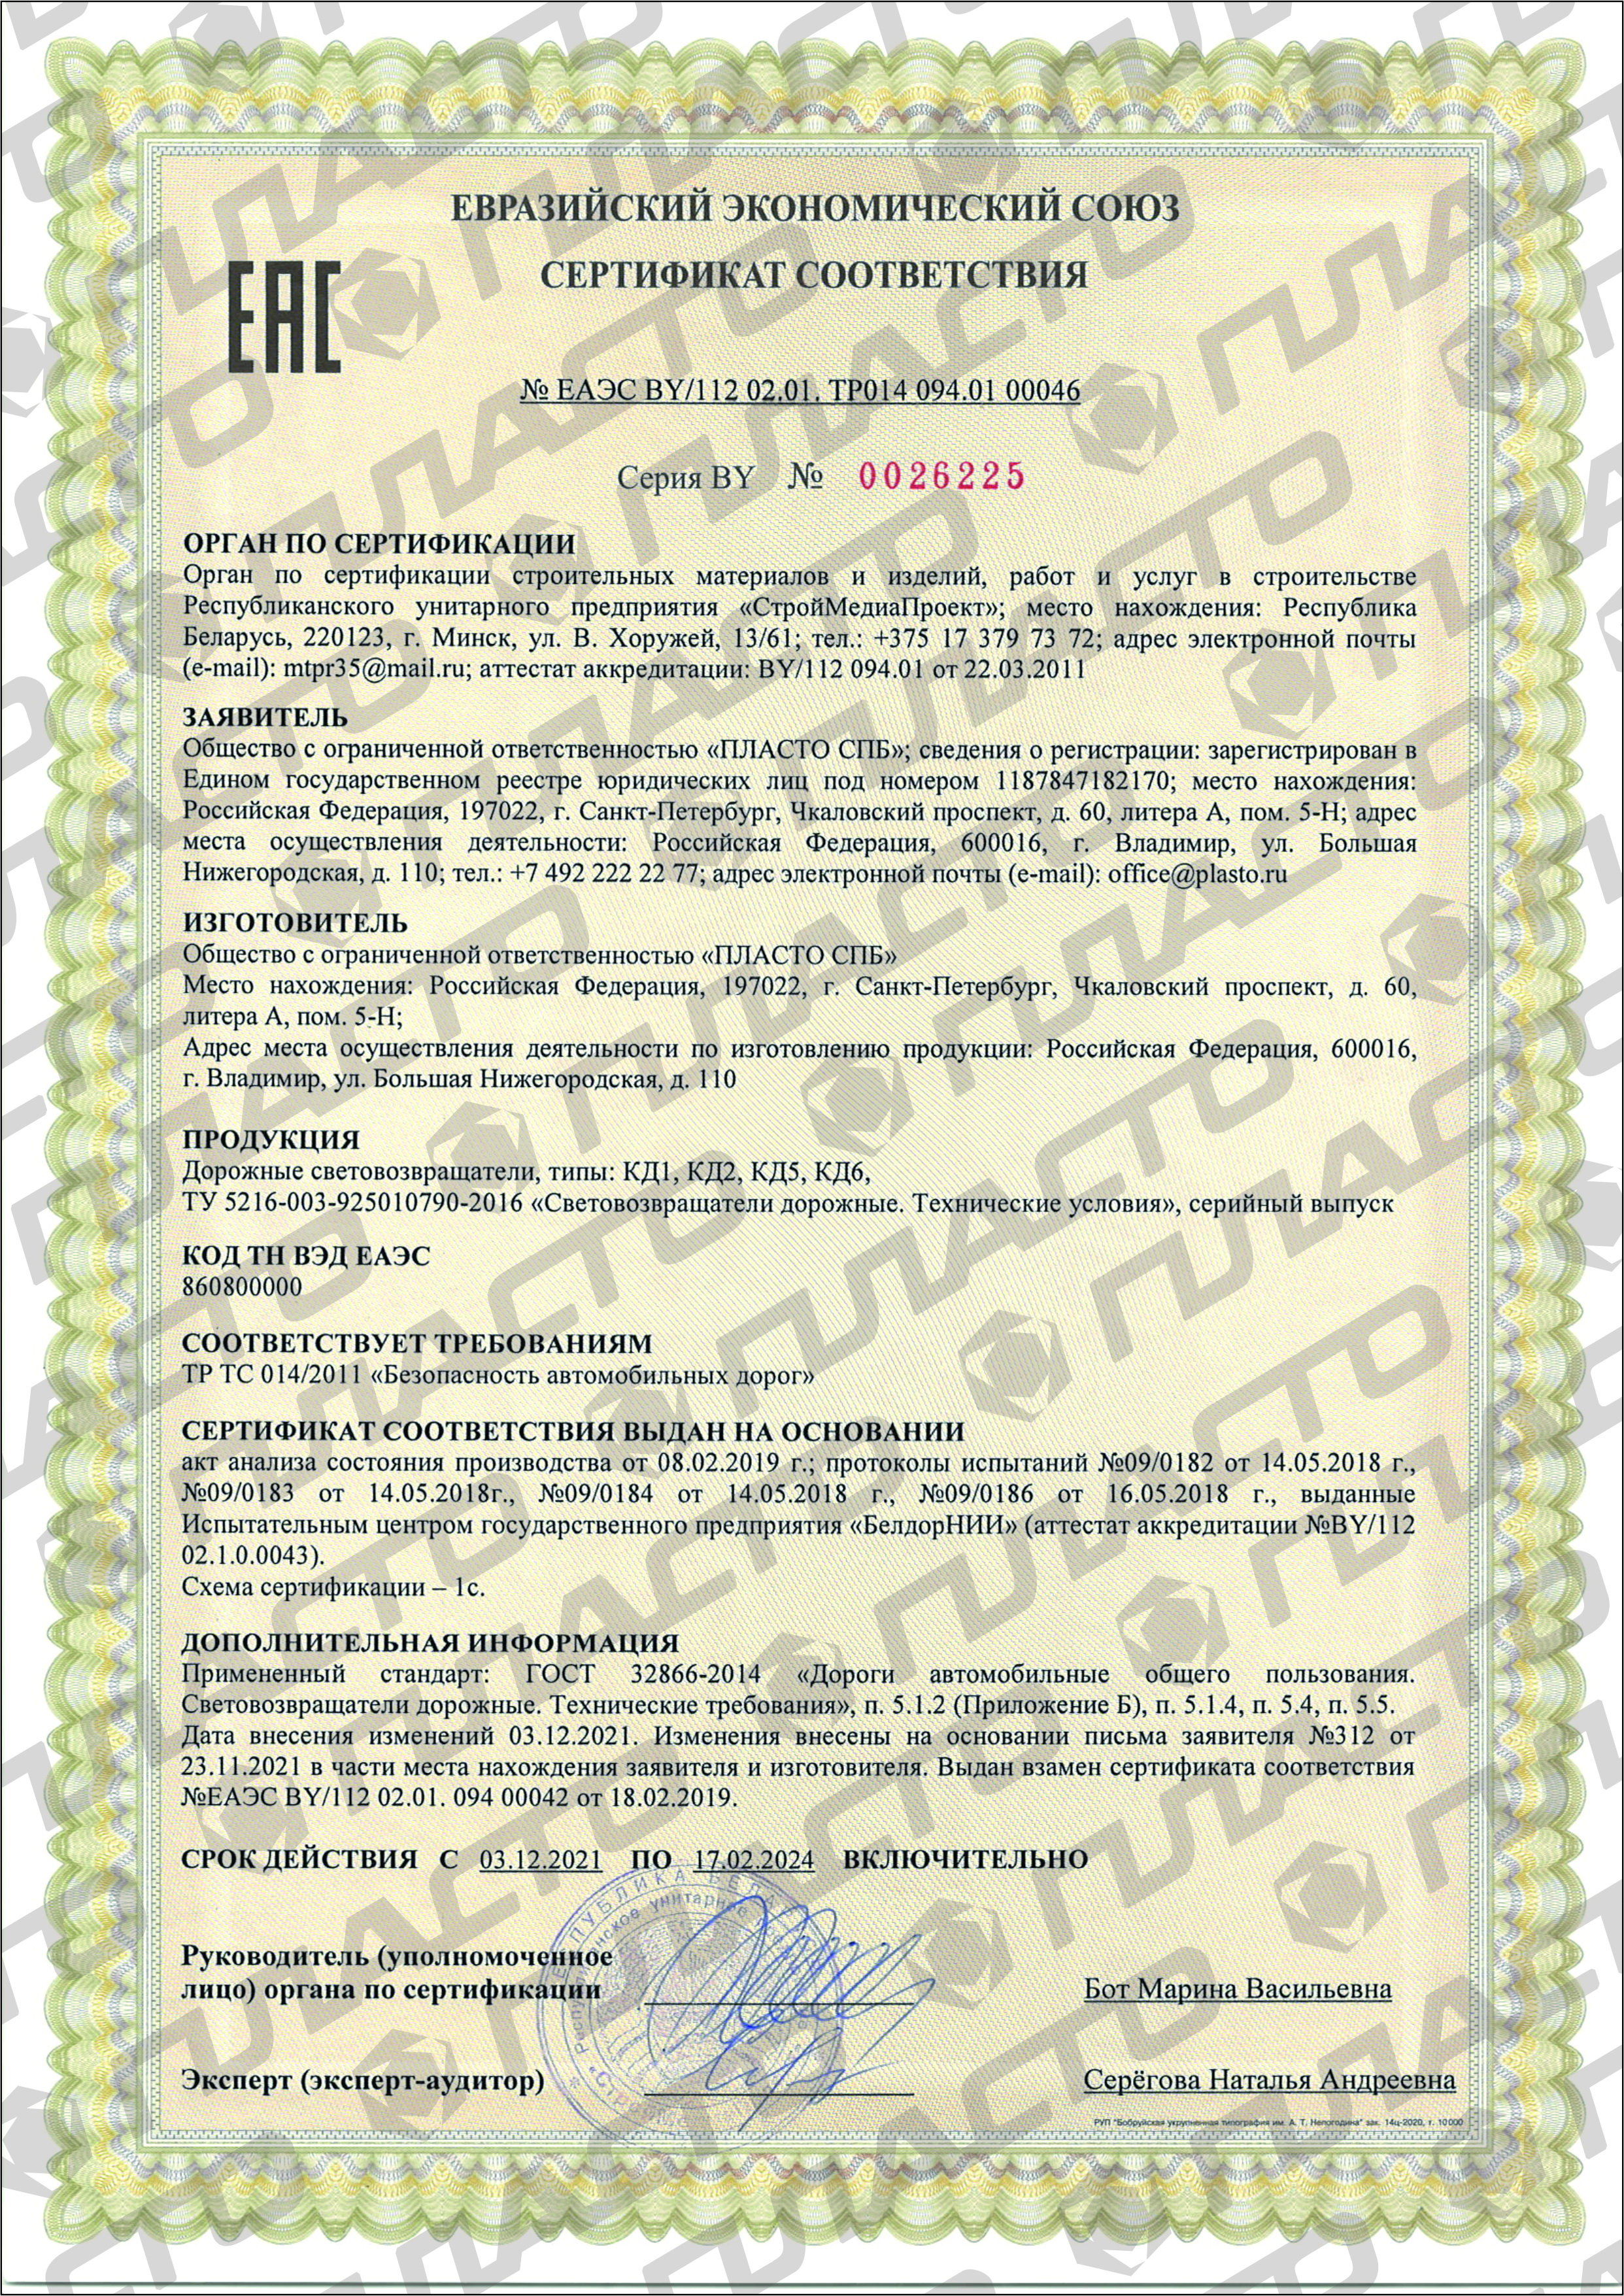 Катафоты КД-5 ГОСТ 32866-2014